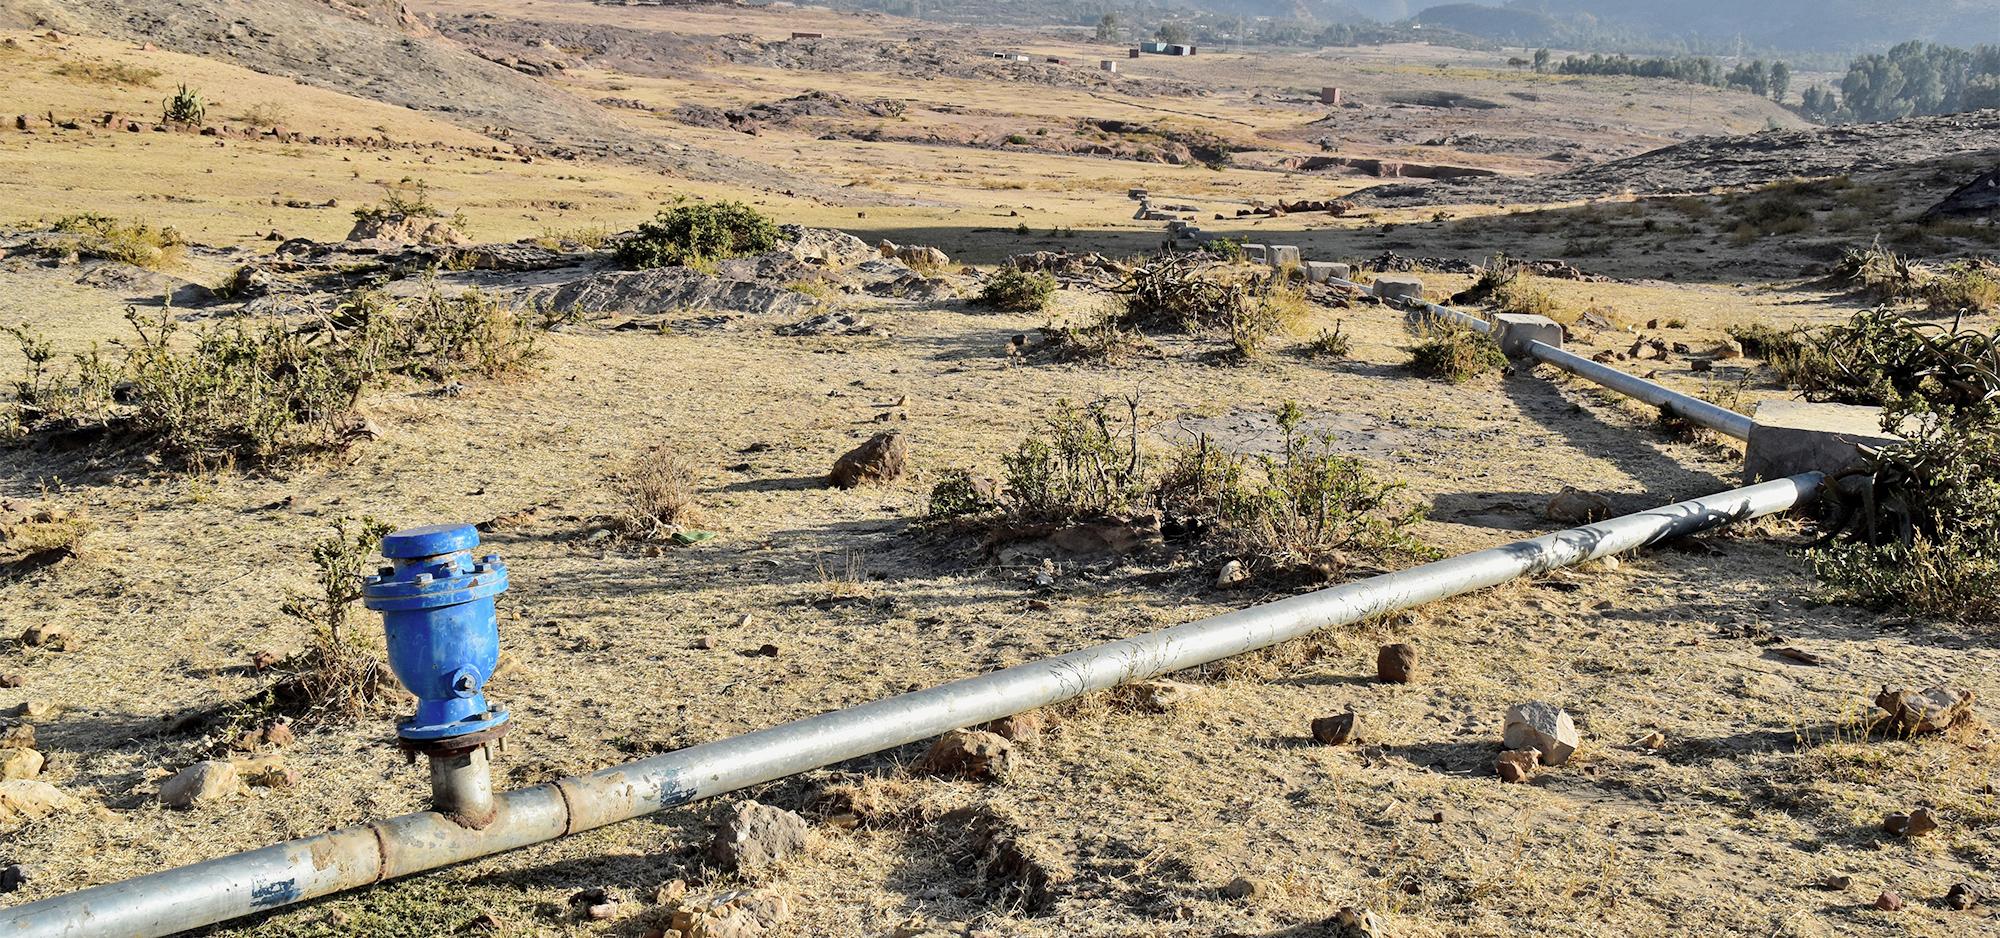 Wasserleitung in Afrika